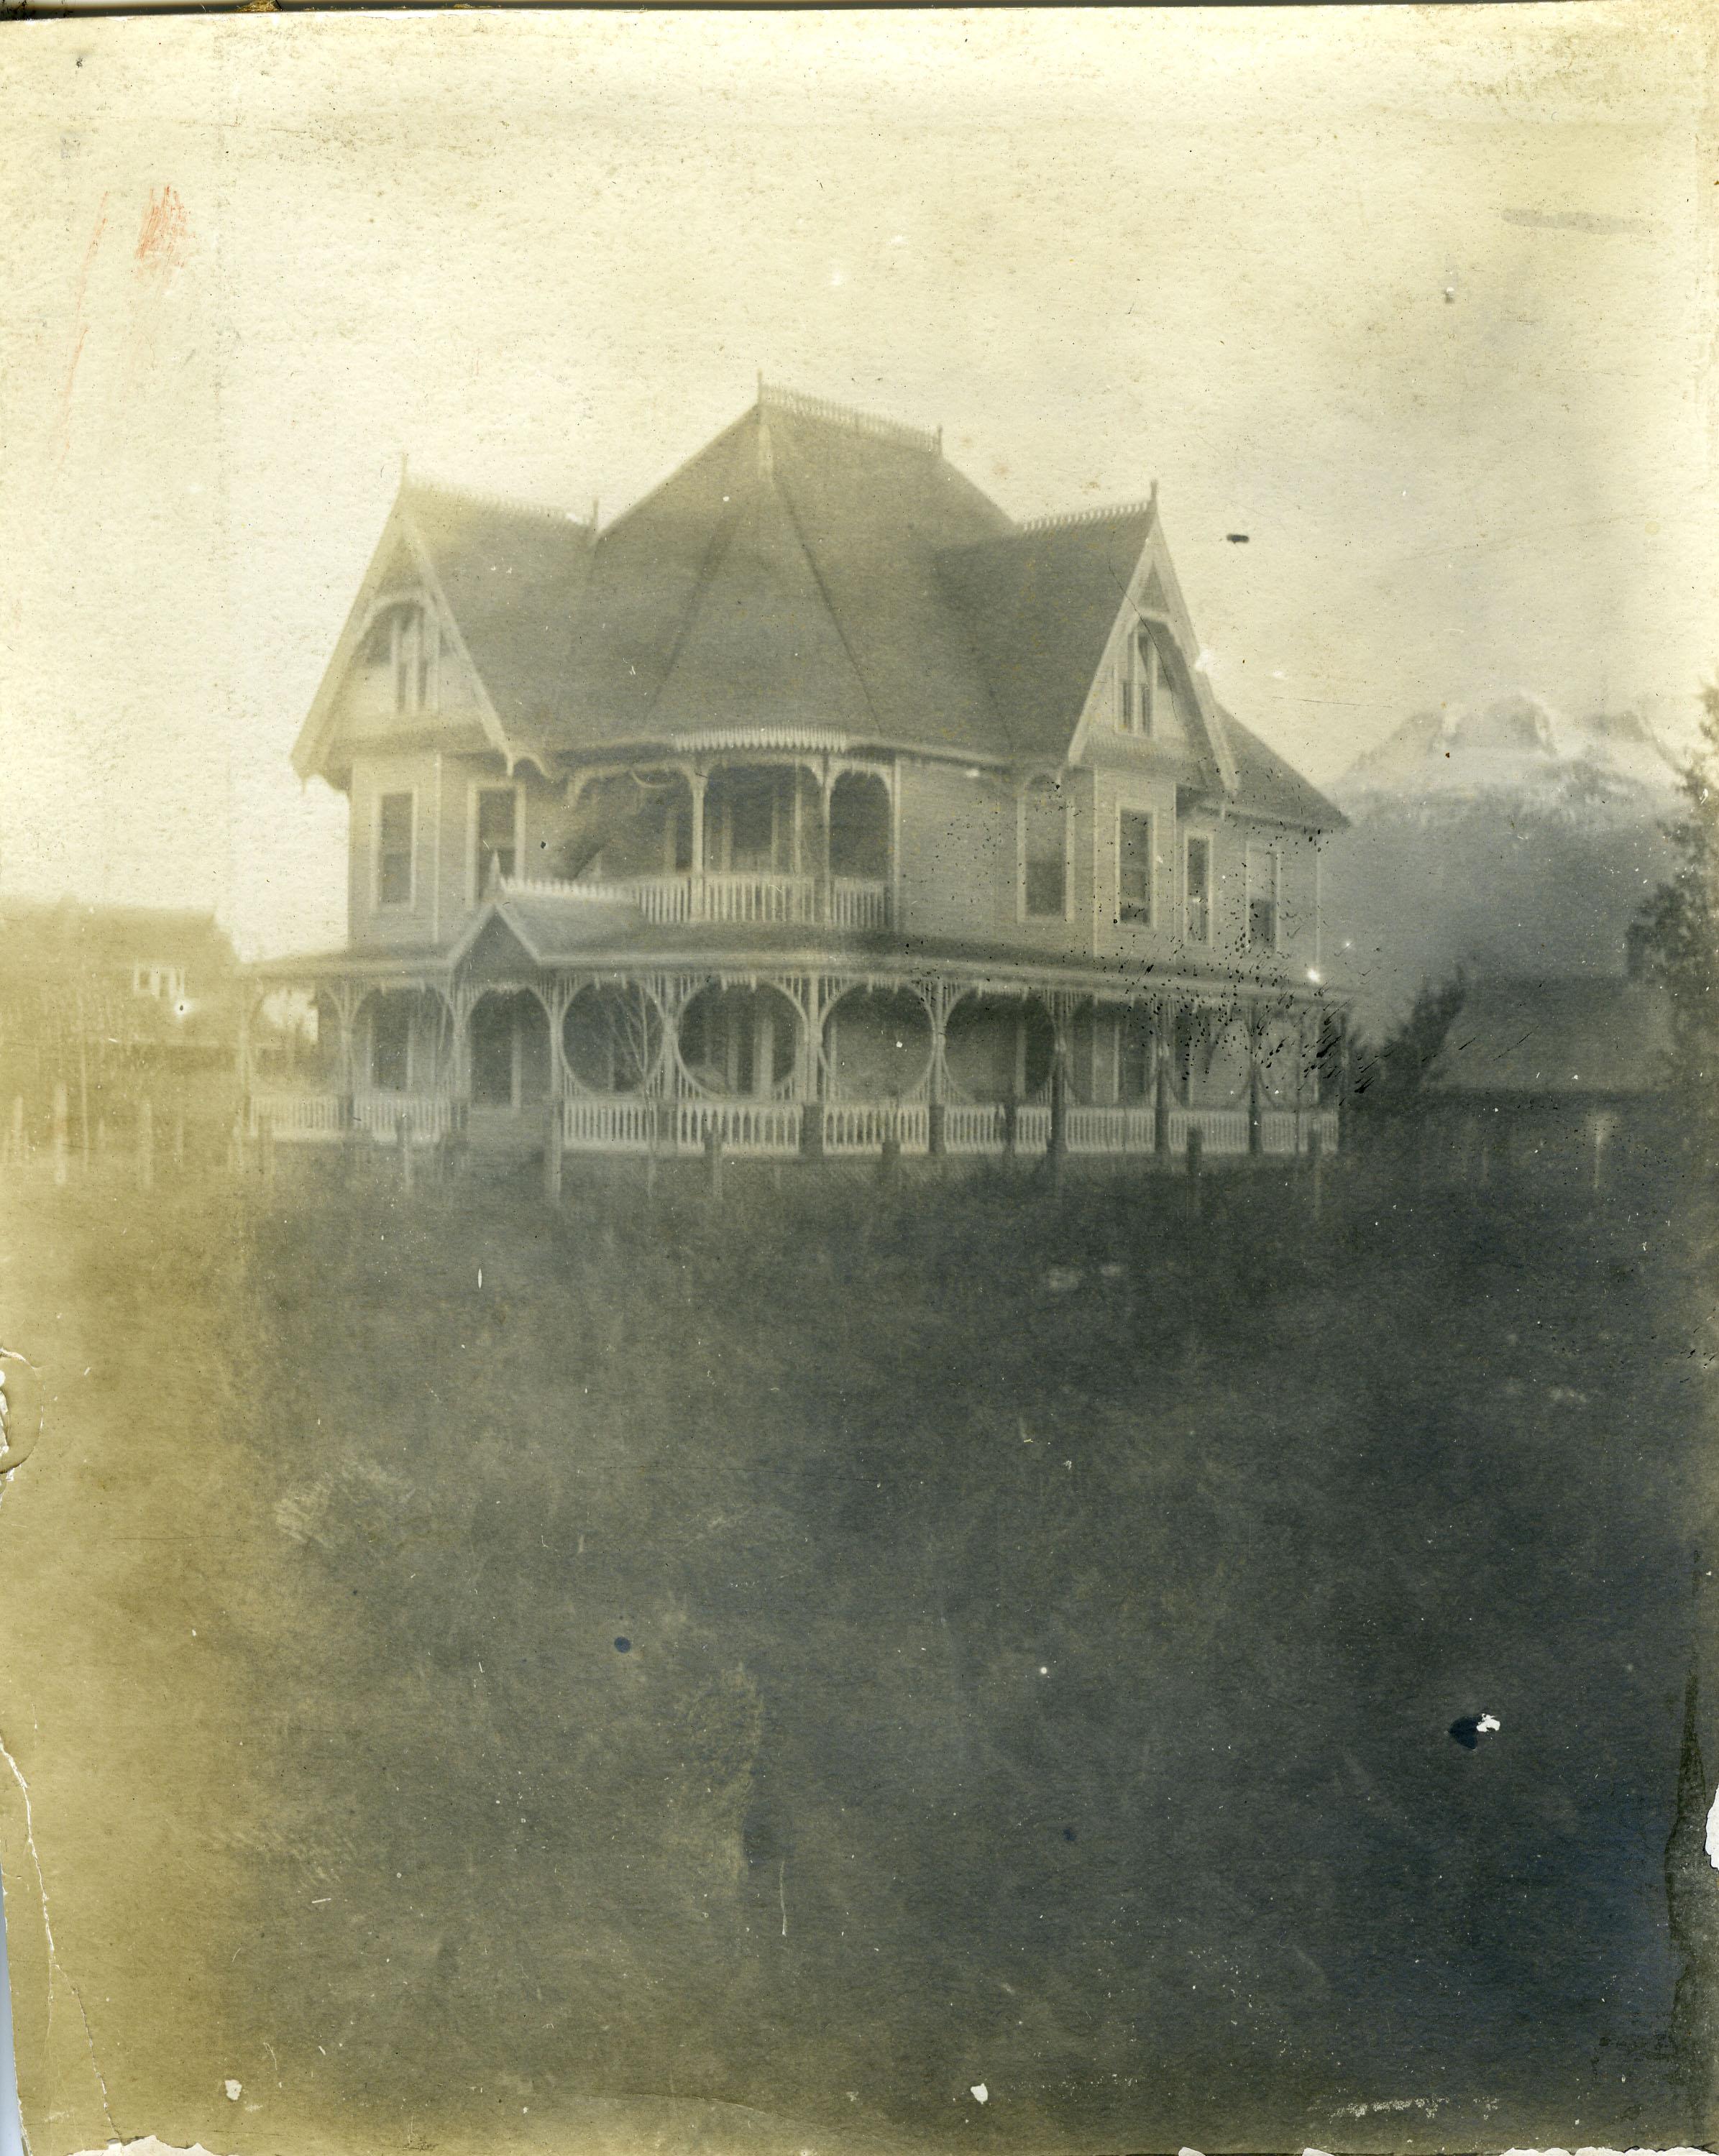 The Holten home, 1221 Front Street, Revelstoke.